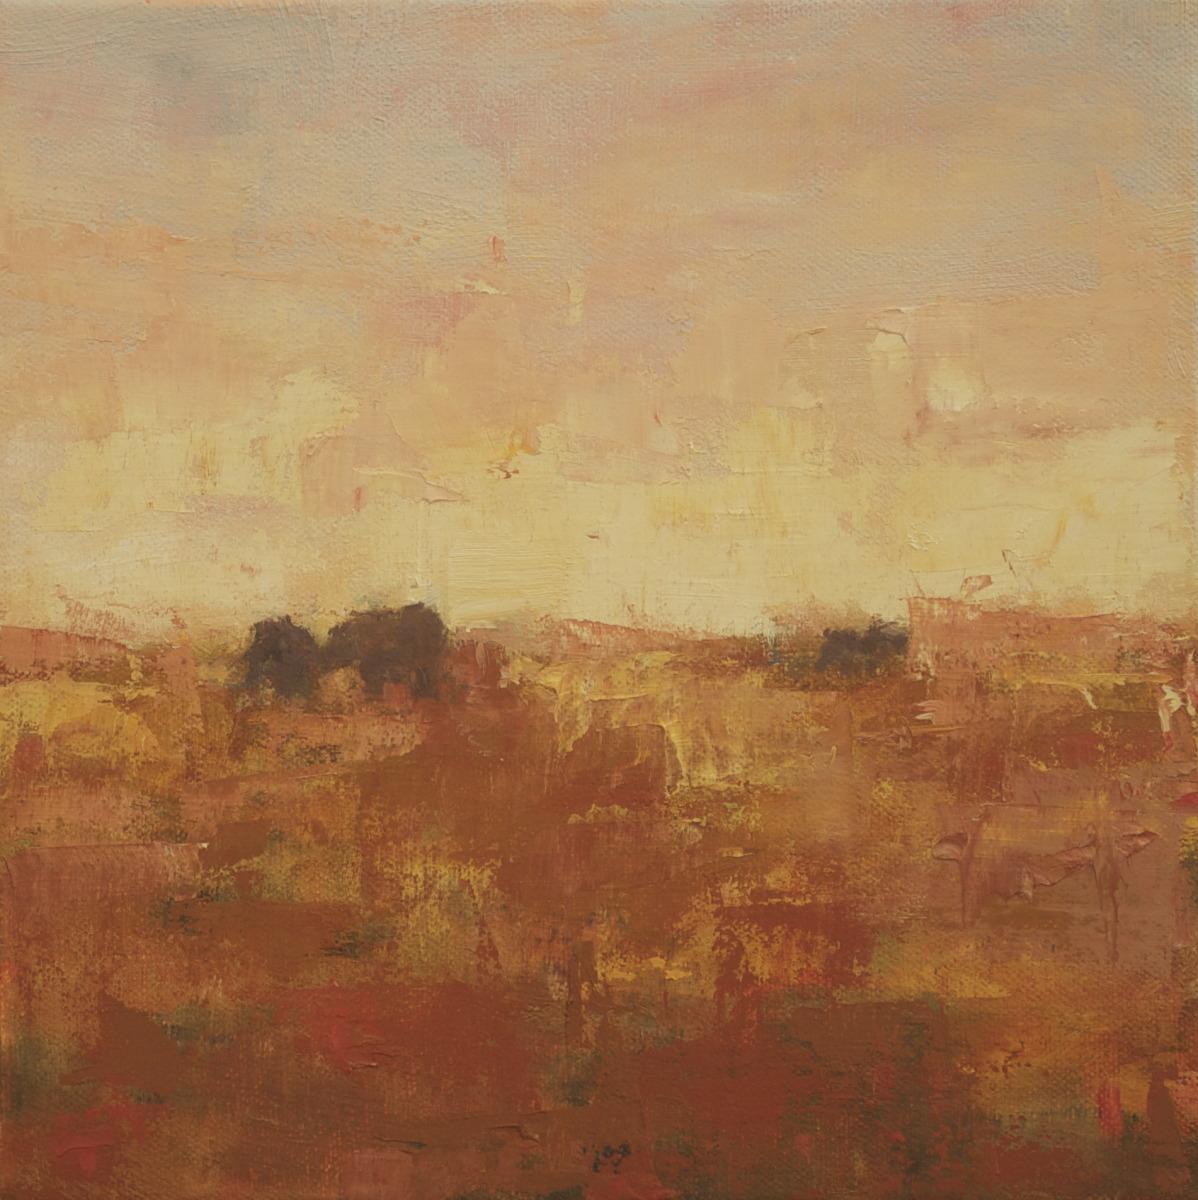 elephants on the horizon (large view)